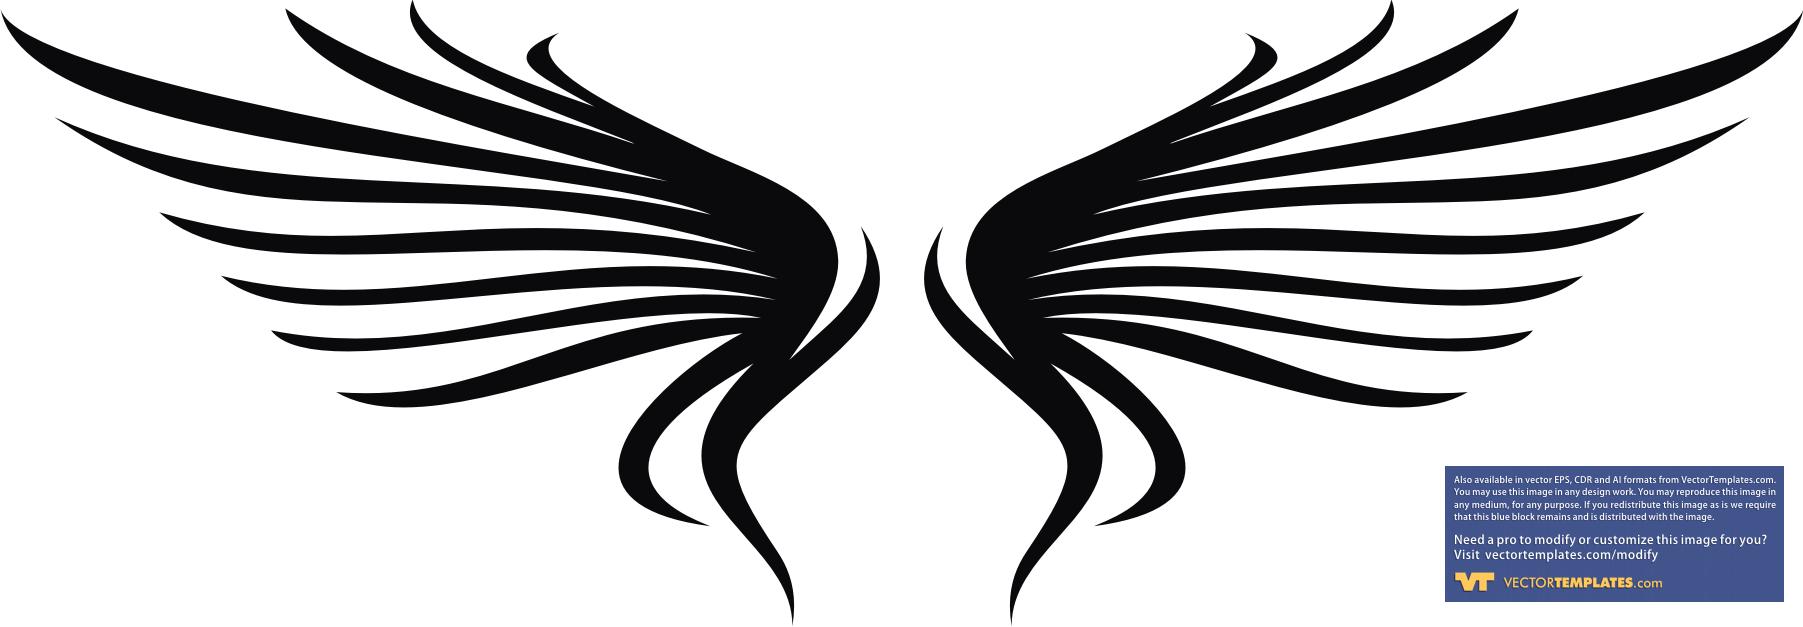 1803x627 Winged Foot Logo Quiz 7765265